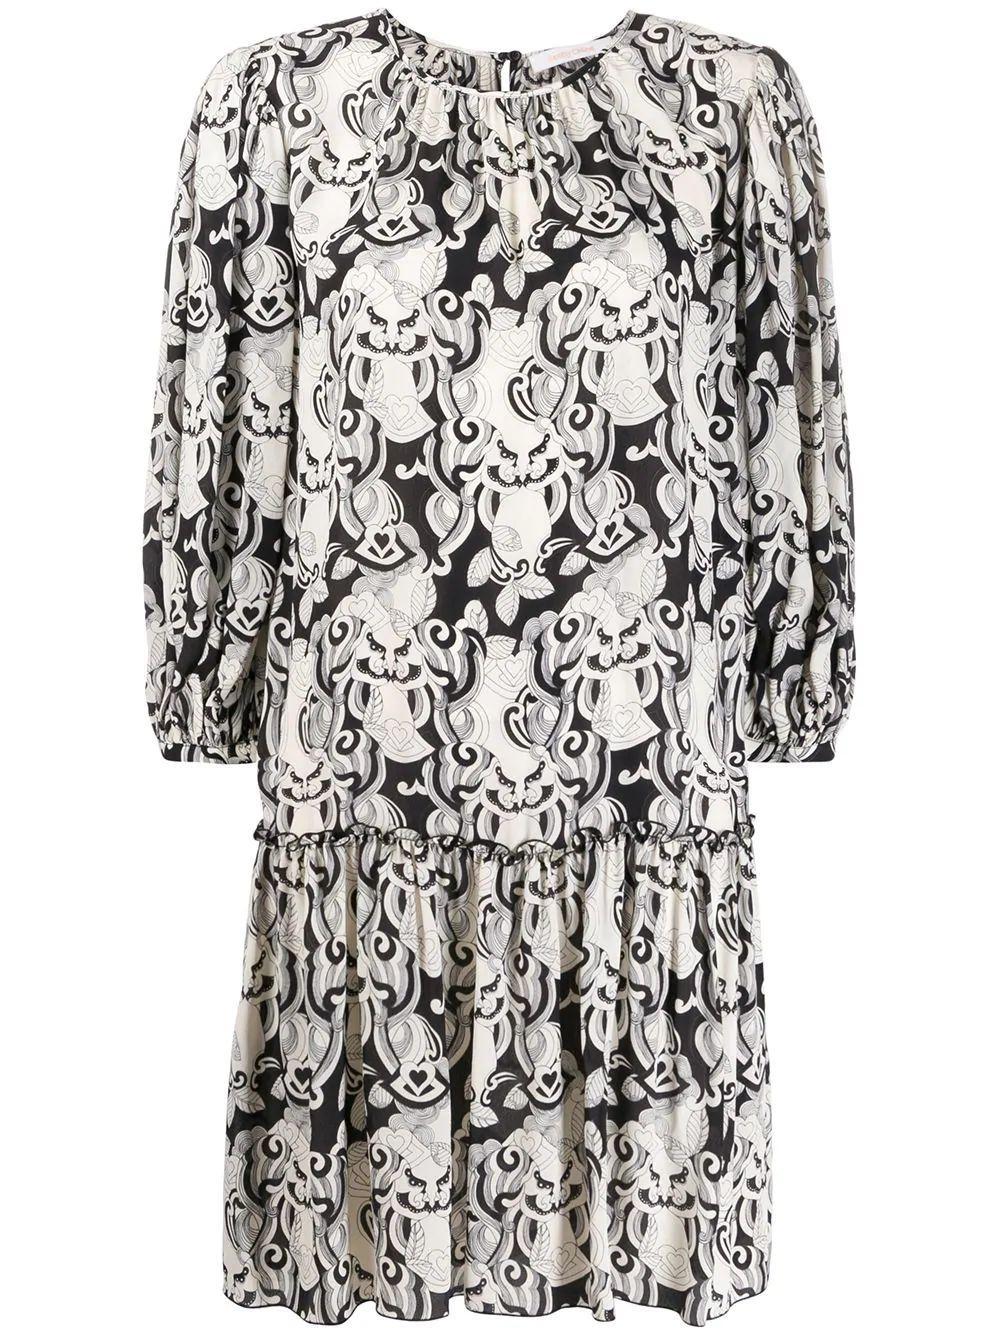 3/4 Sleeve Her On Silk Mix Dress Item # CHS20SRO33038